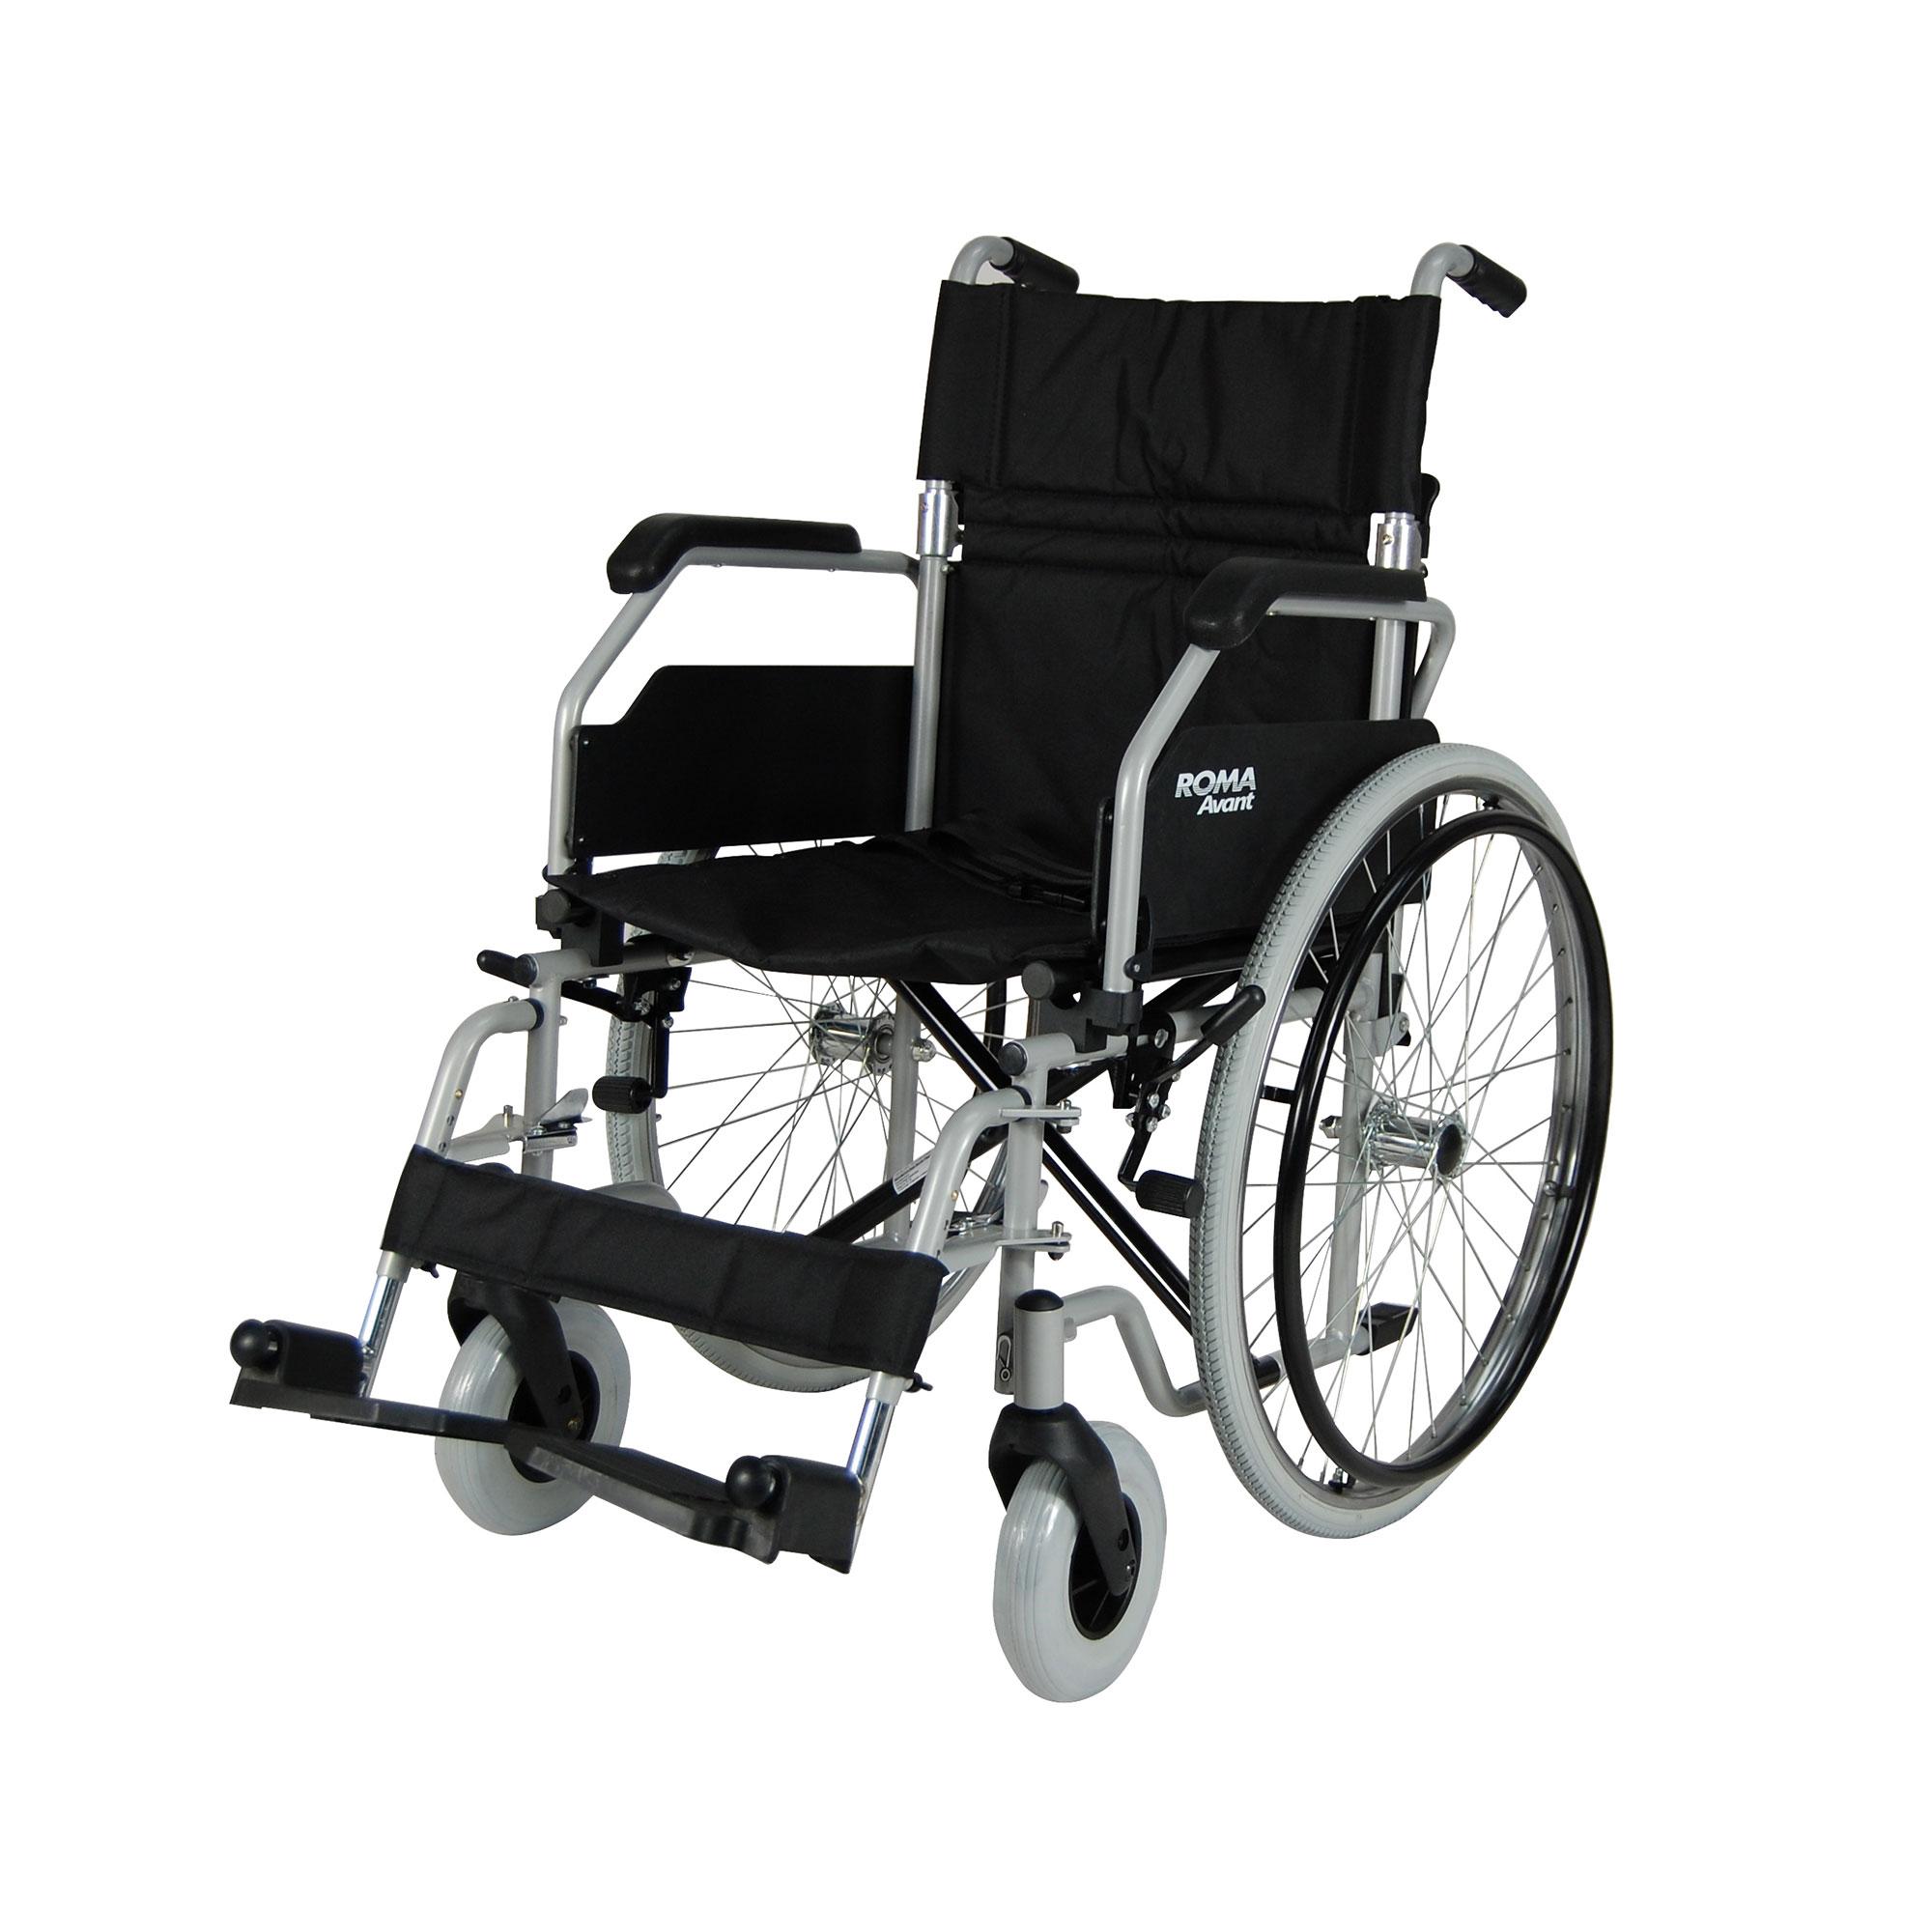 1610 Avant Steel Self Propelling Wheelchair Roma Medical